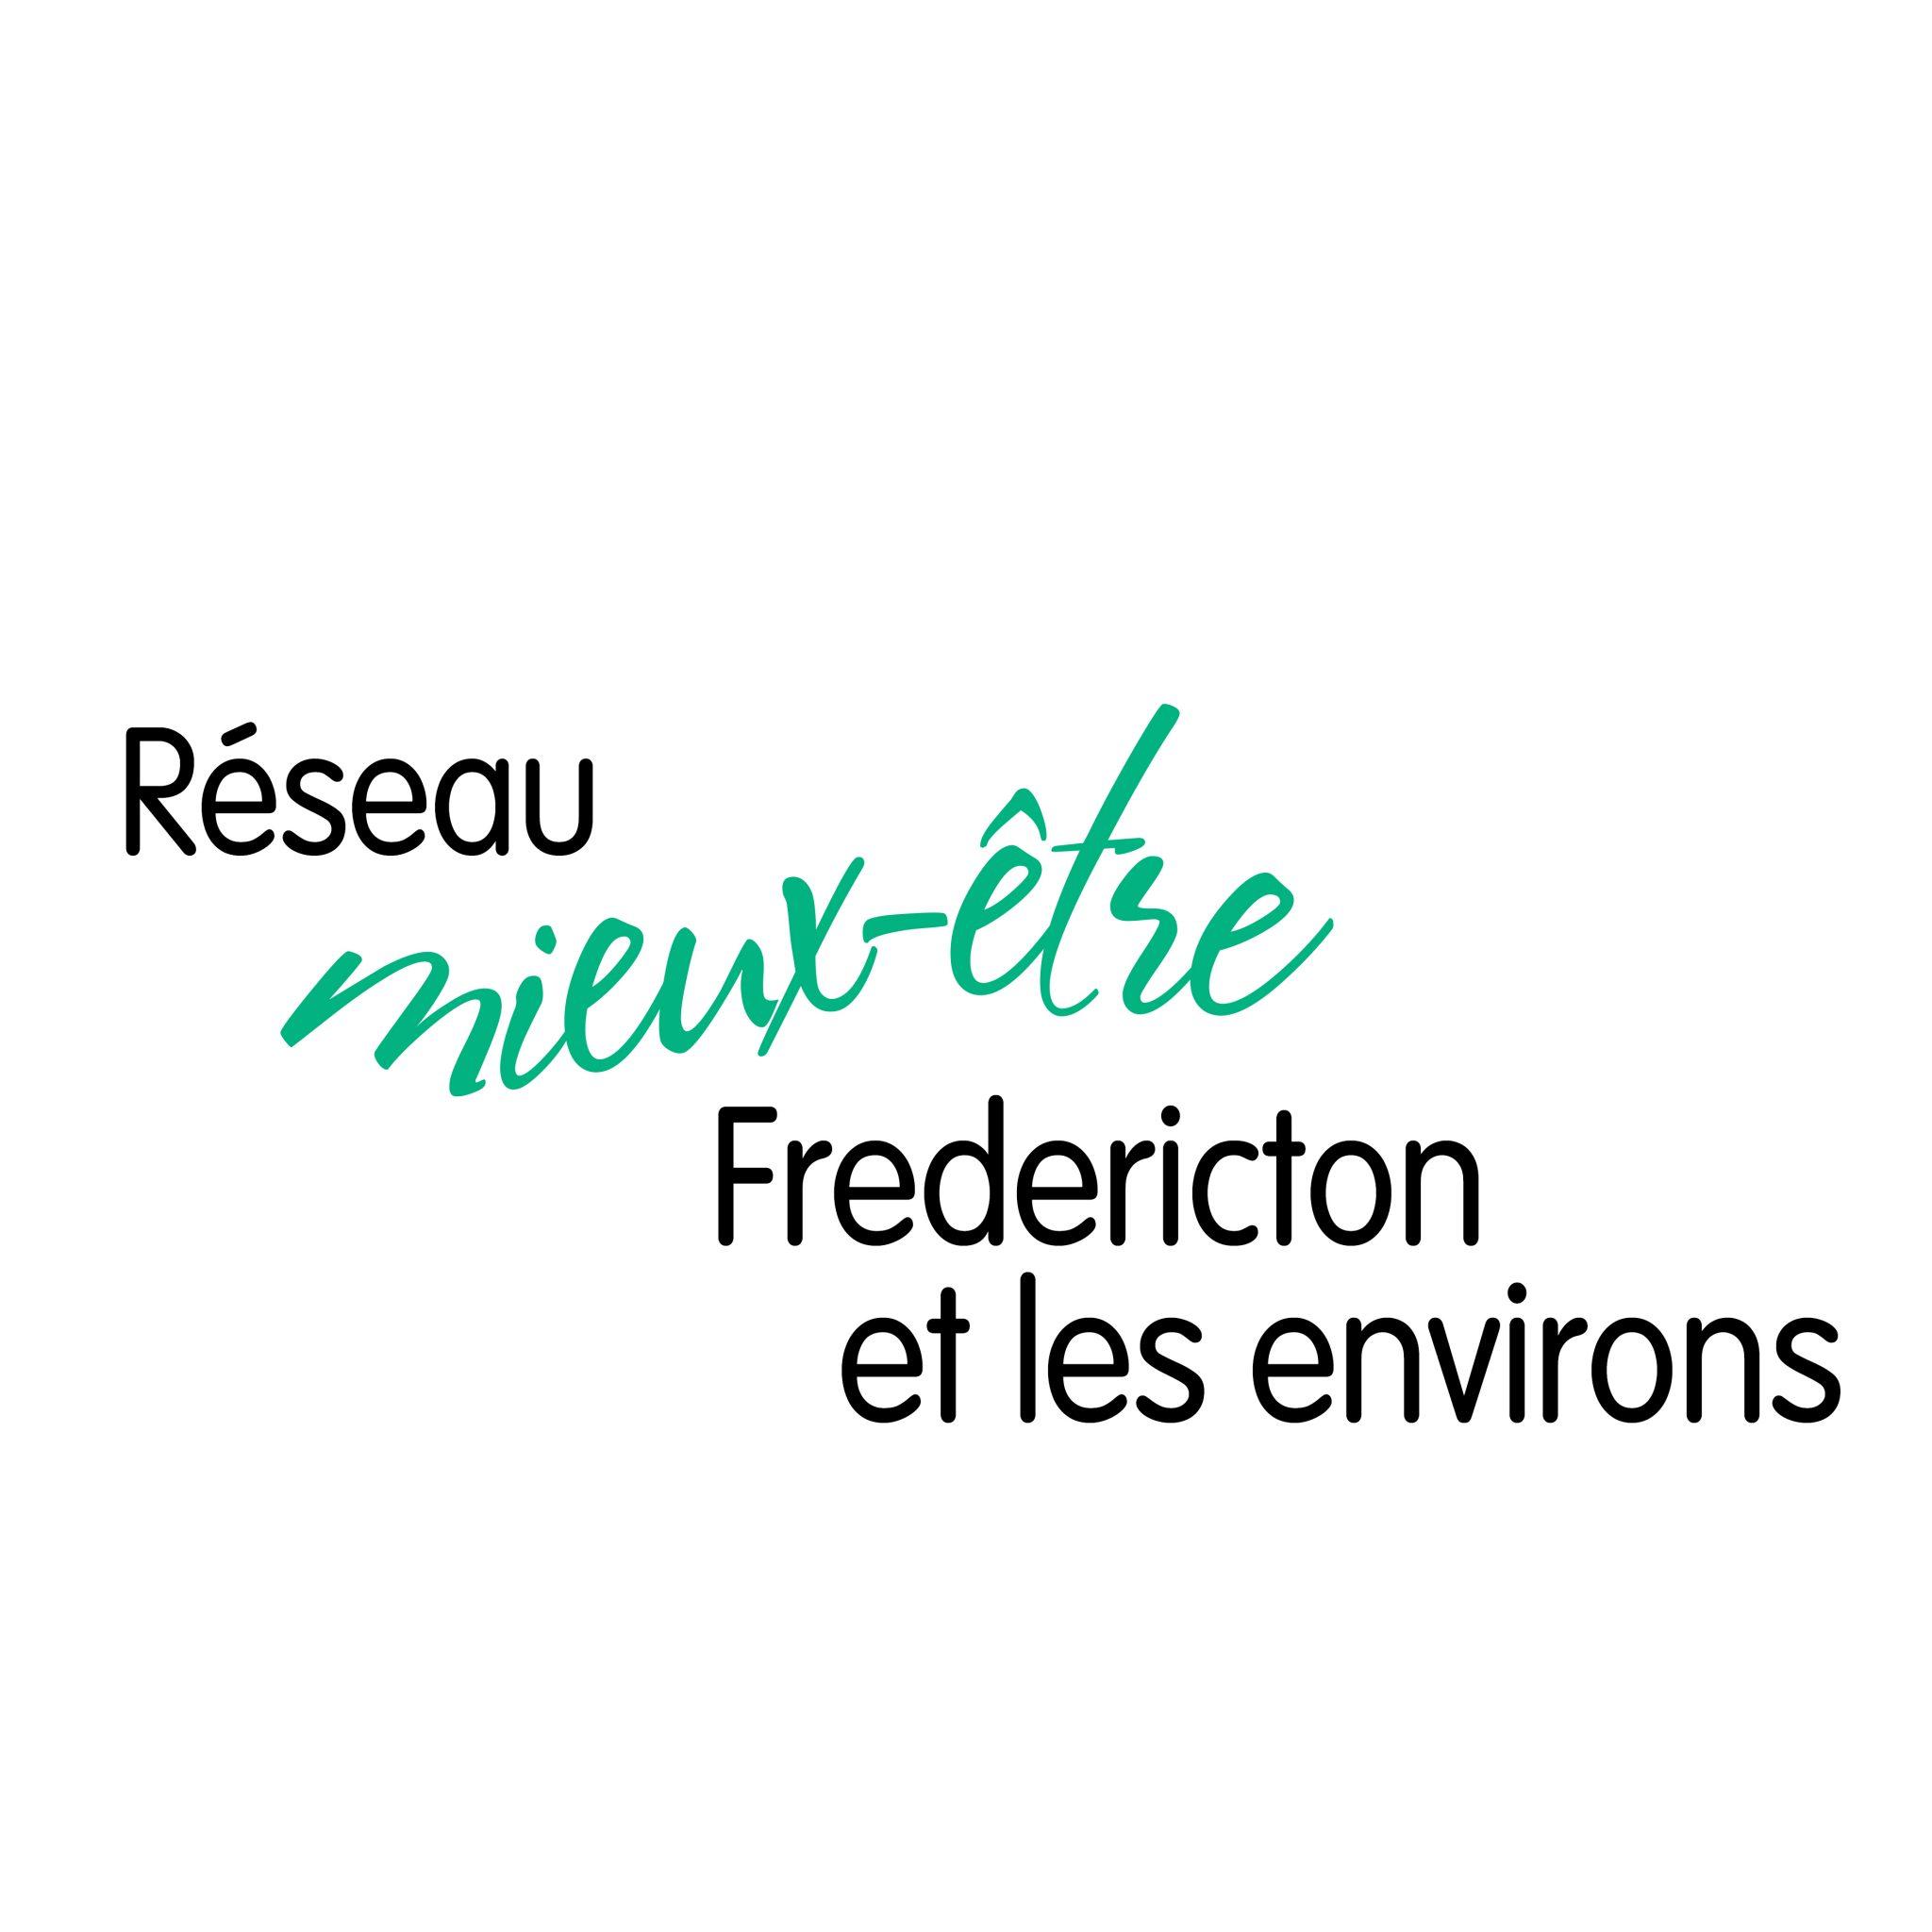 Fredericton et environs